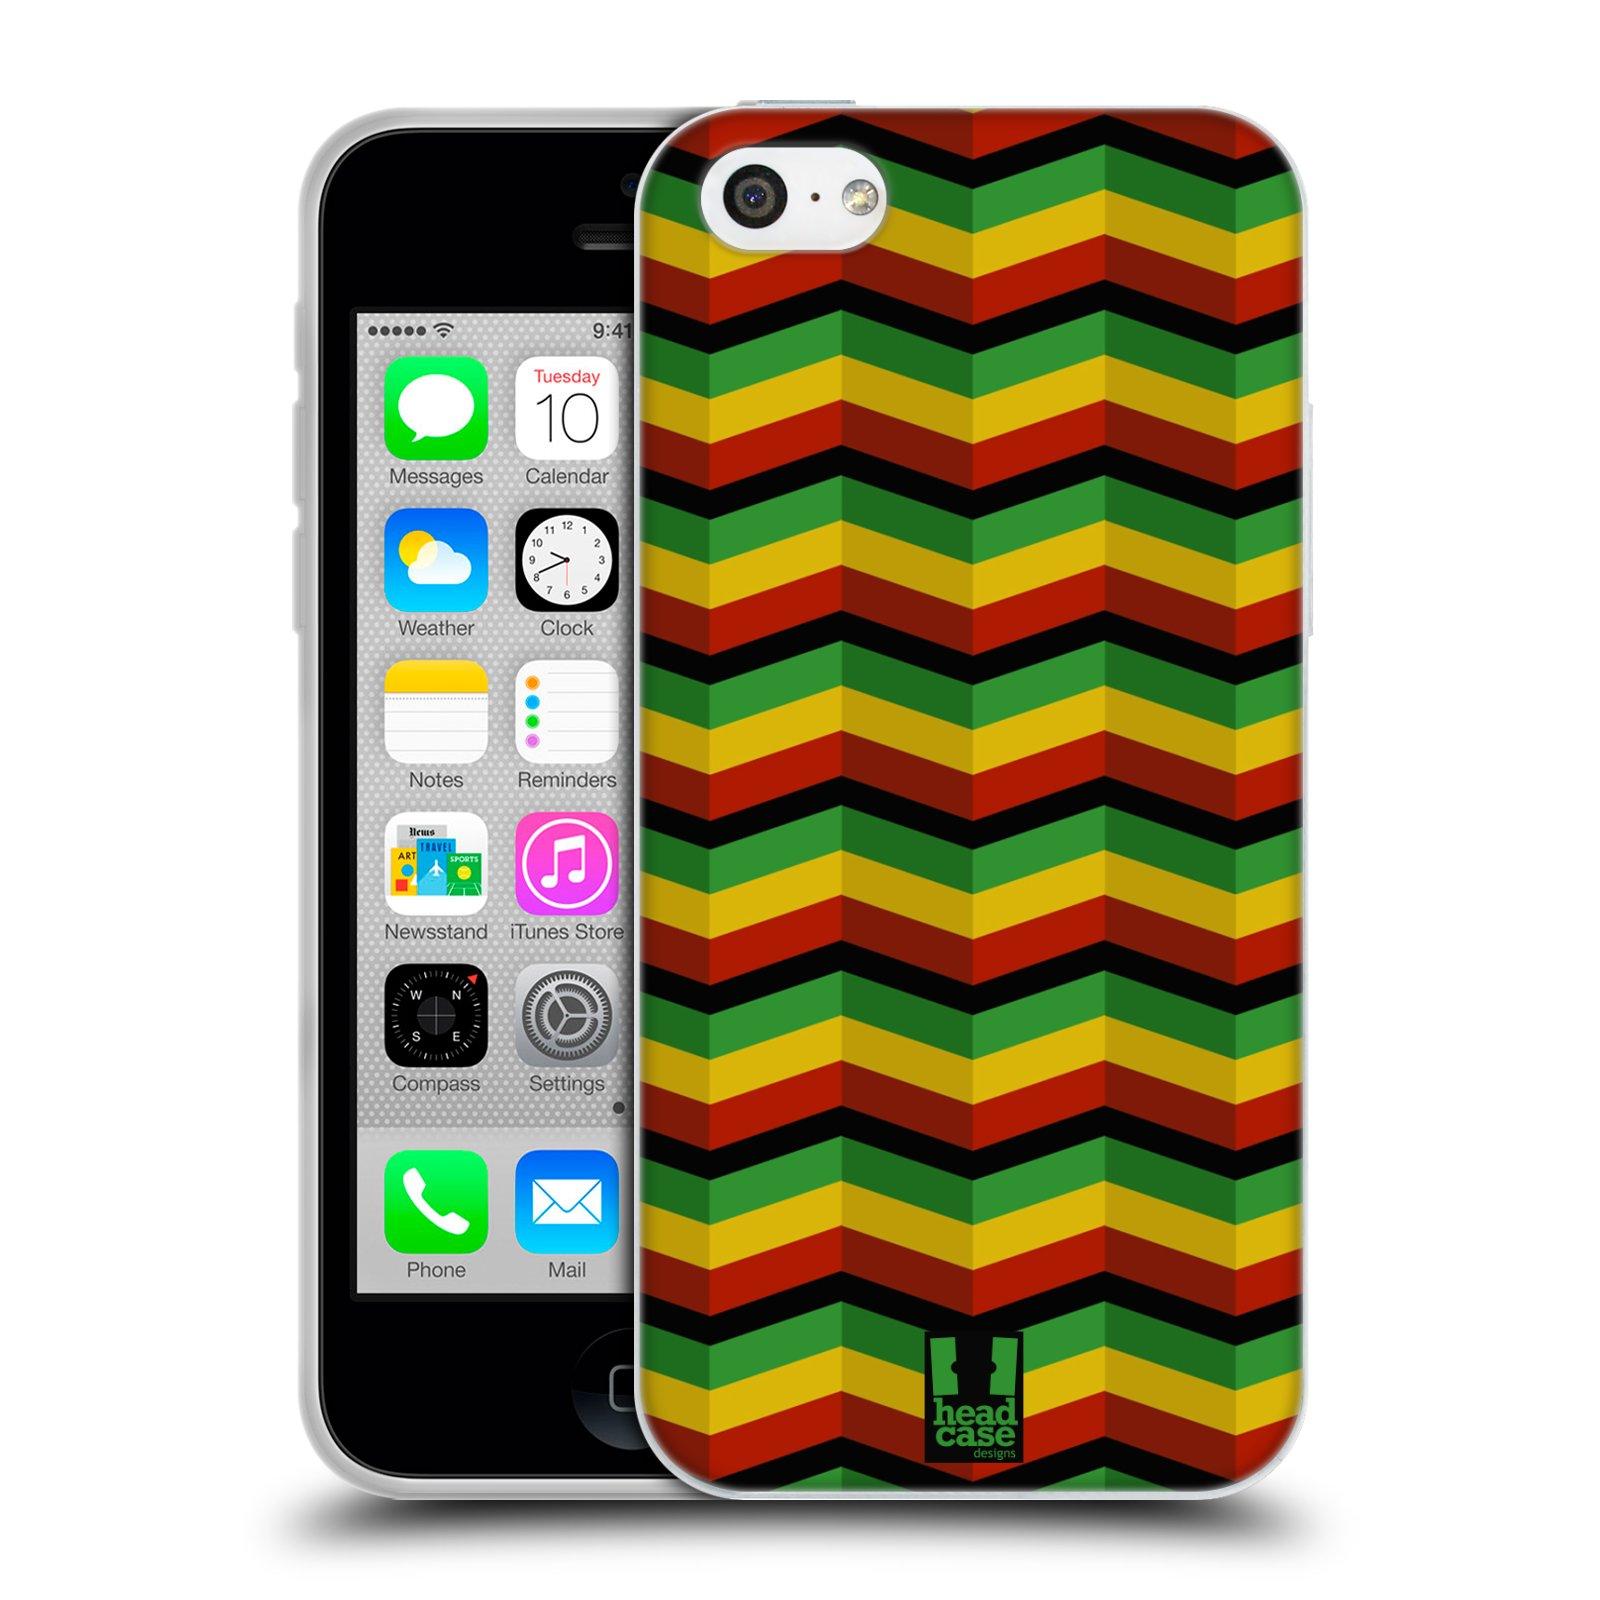 HEAD CASE silikonový obal na mobil Apple Iphone 5C vzor Rasta barevné vzory CHEVRON